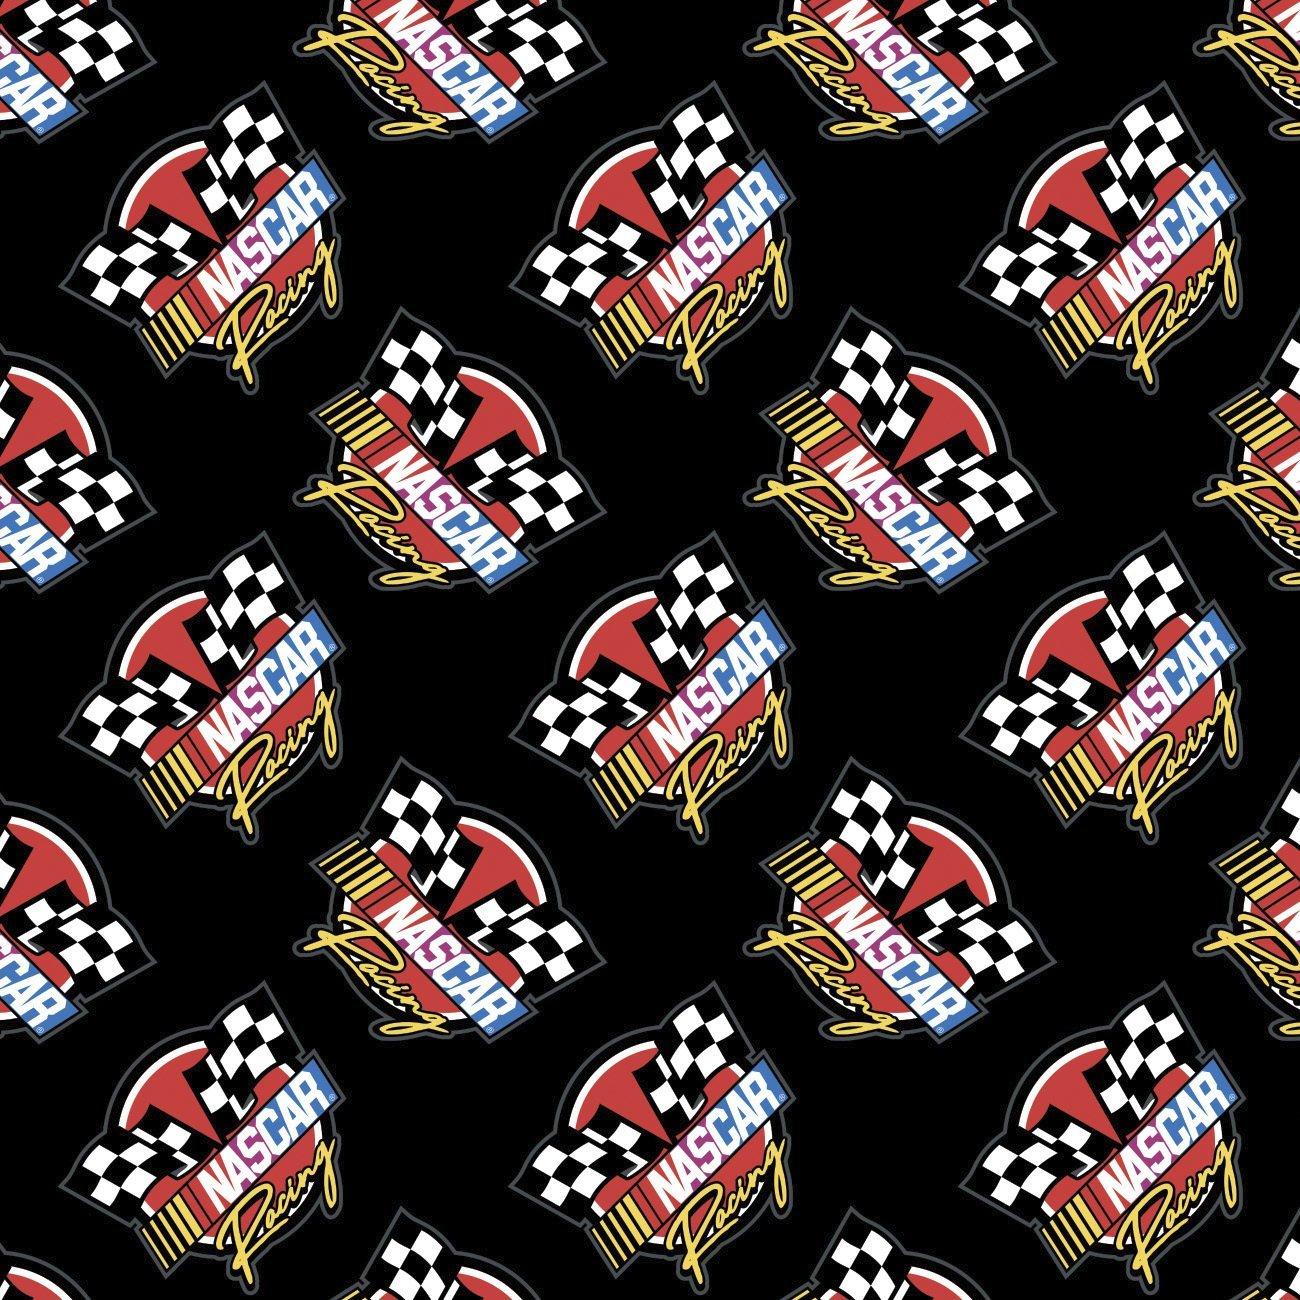 Nascar 39190106-3 Black Retro Racing